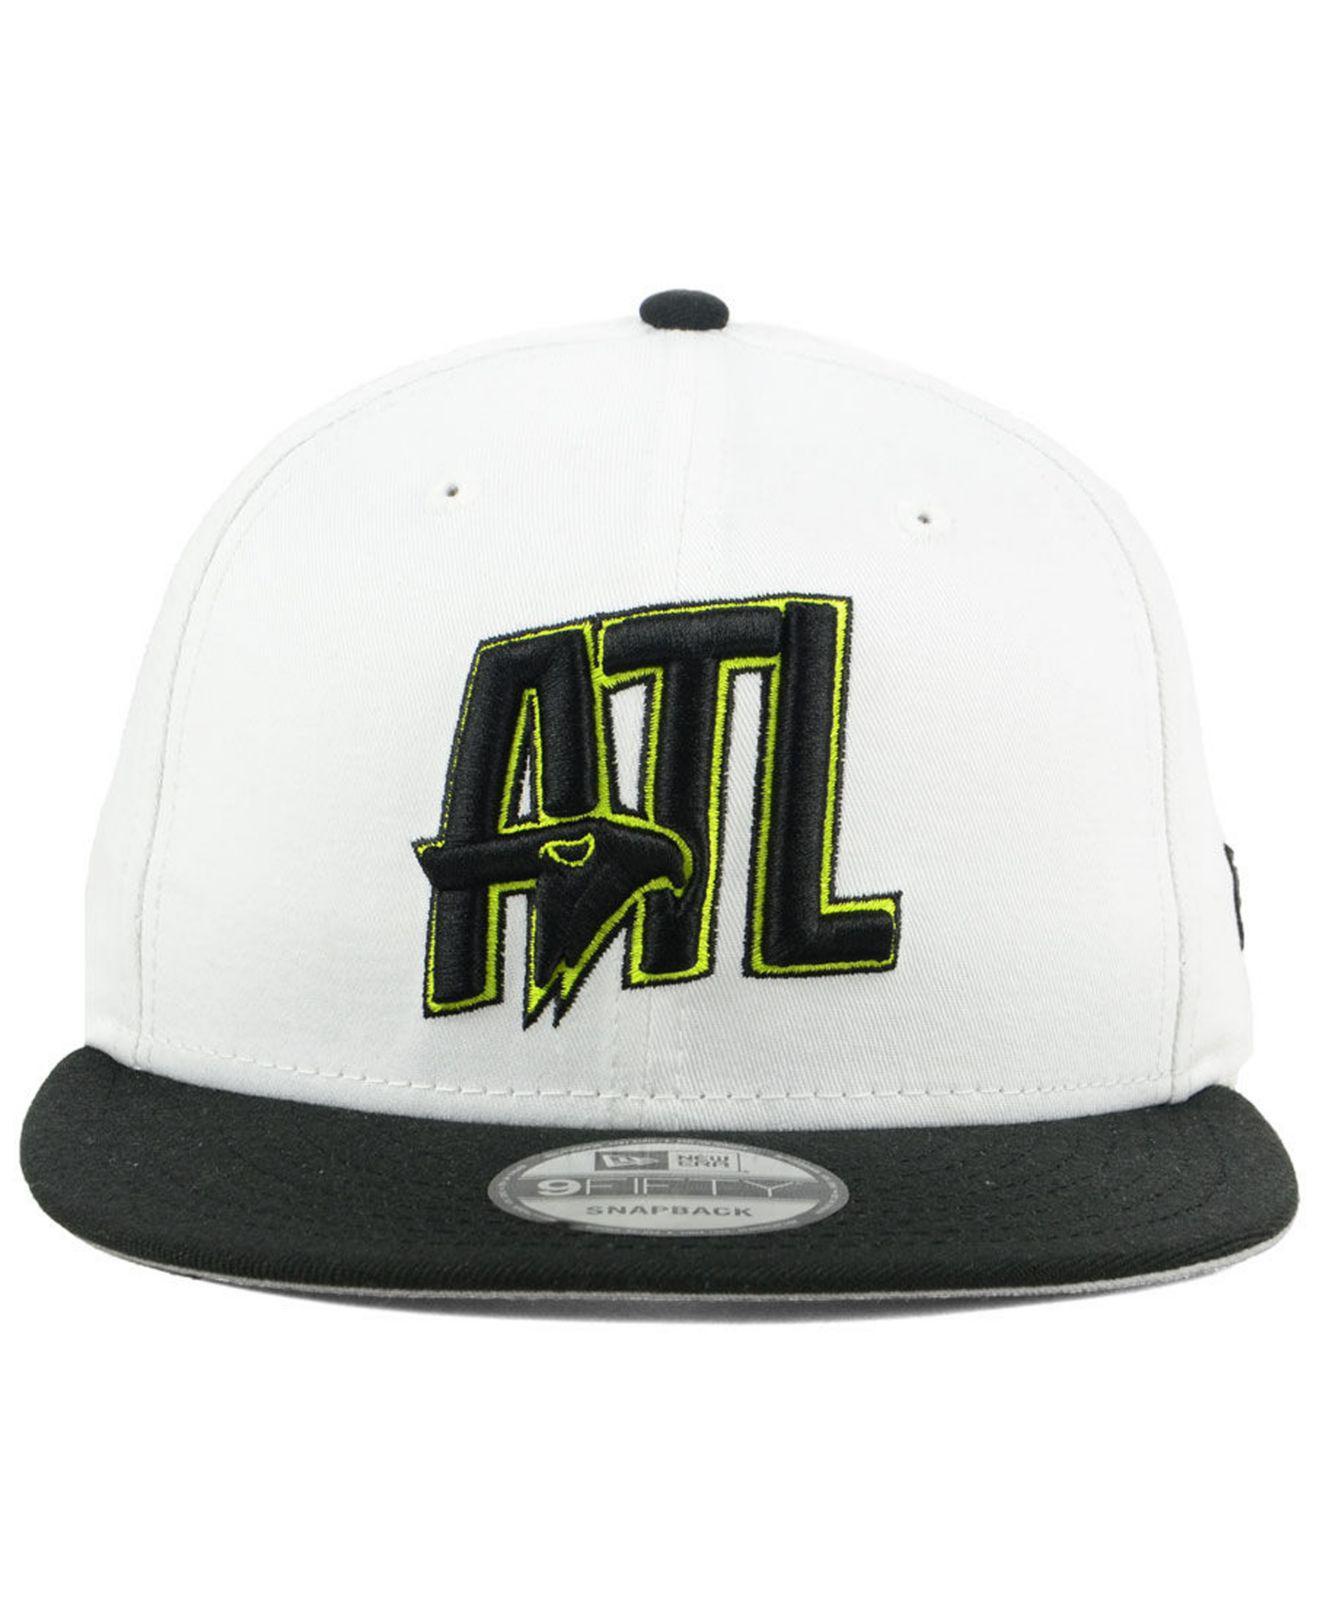 best cheap 6b4d7 0d6a4 Lyst - KTZ Atlanta Hawks Light City Combo 9fifty Snapback Cap in Black for  Men